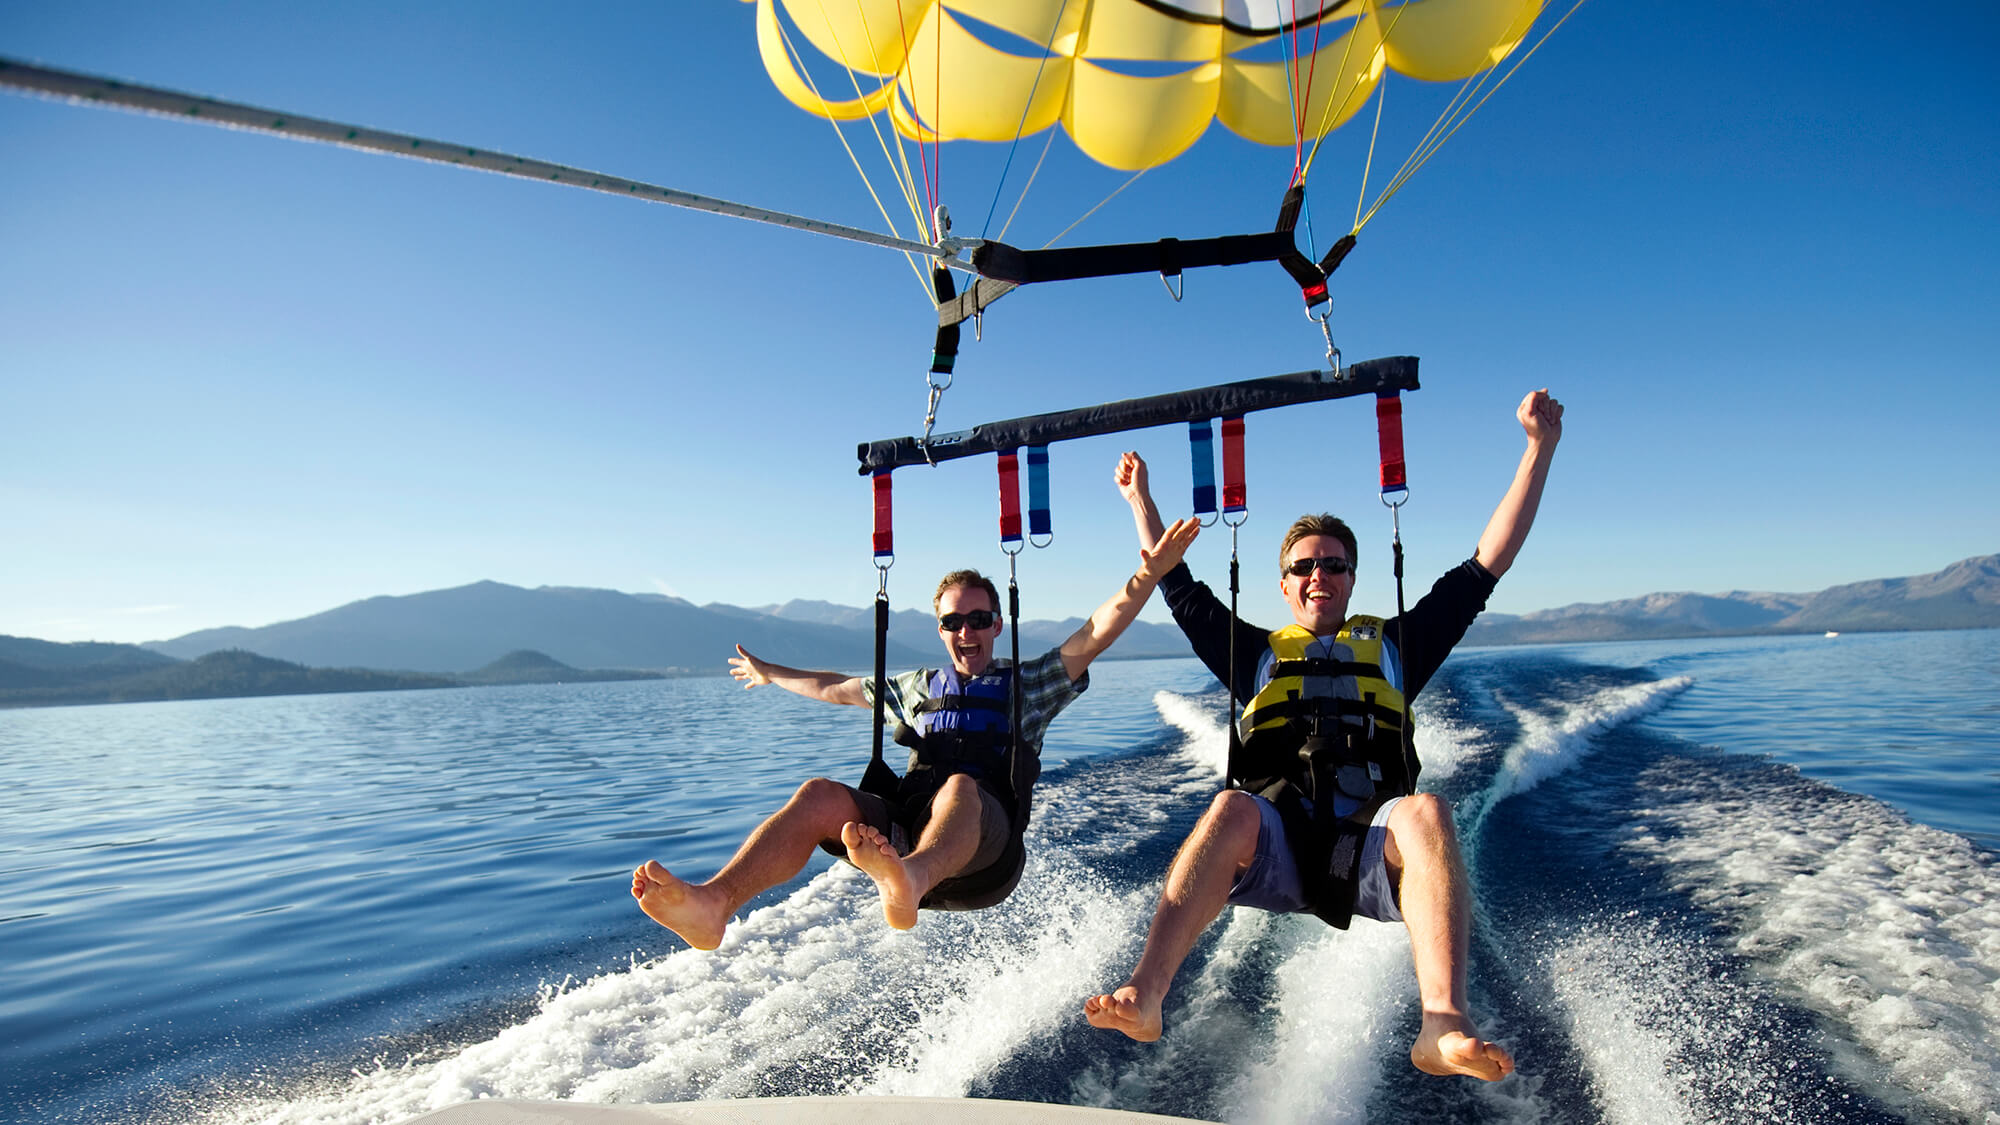 summer in south shore lake tahoe